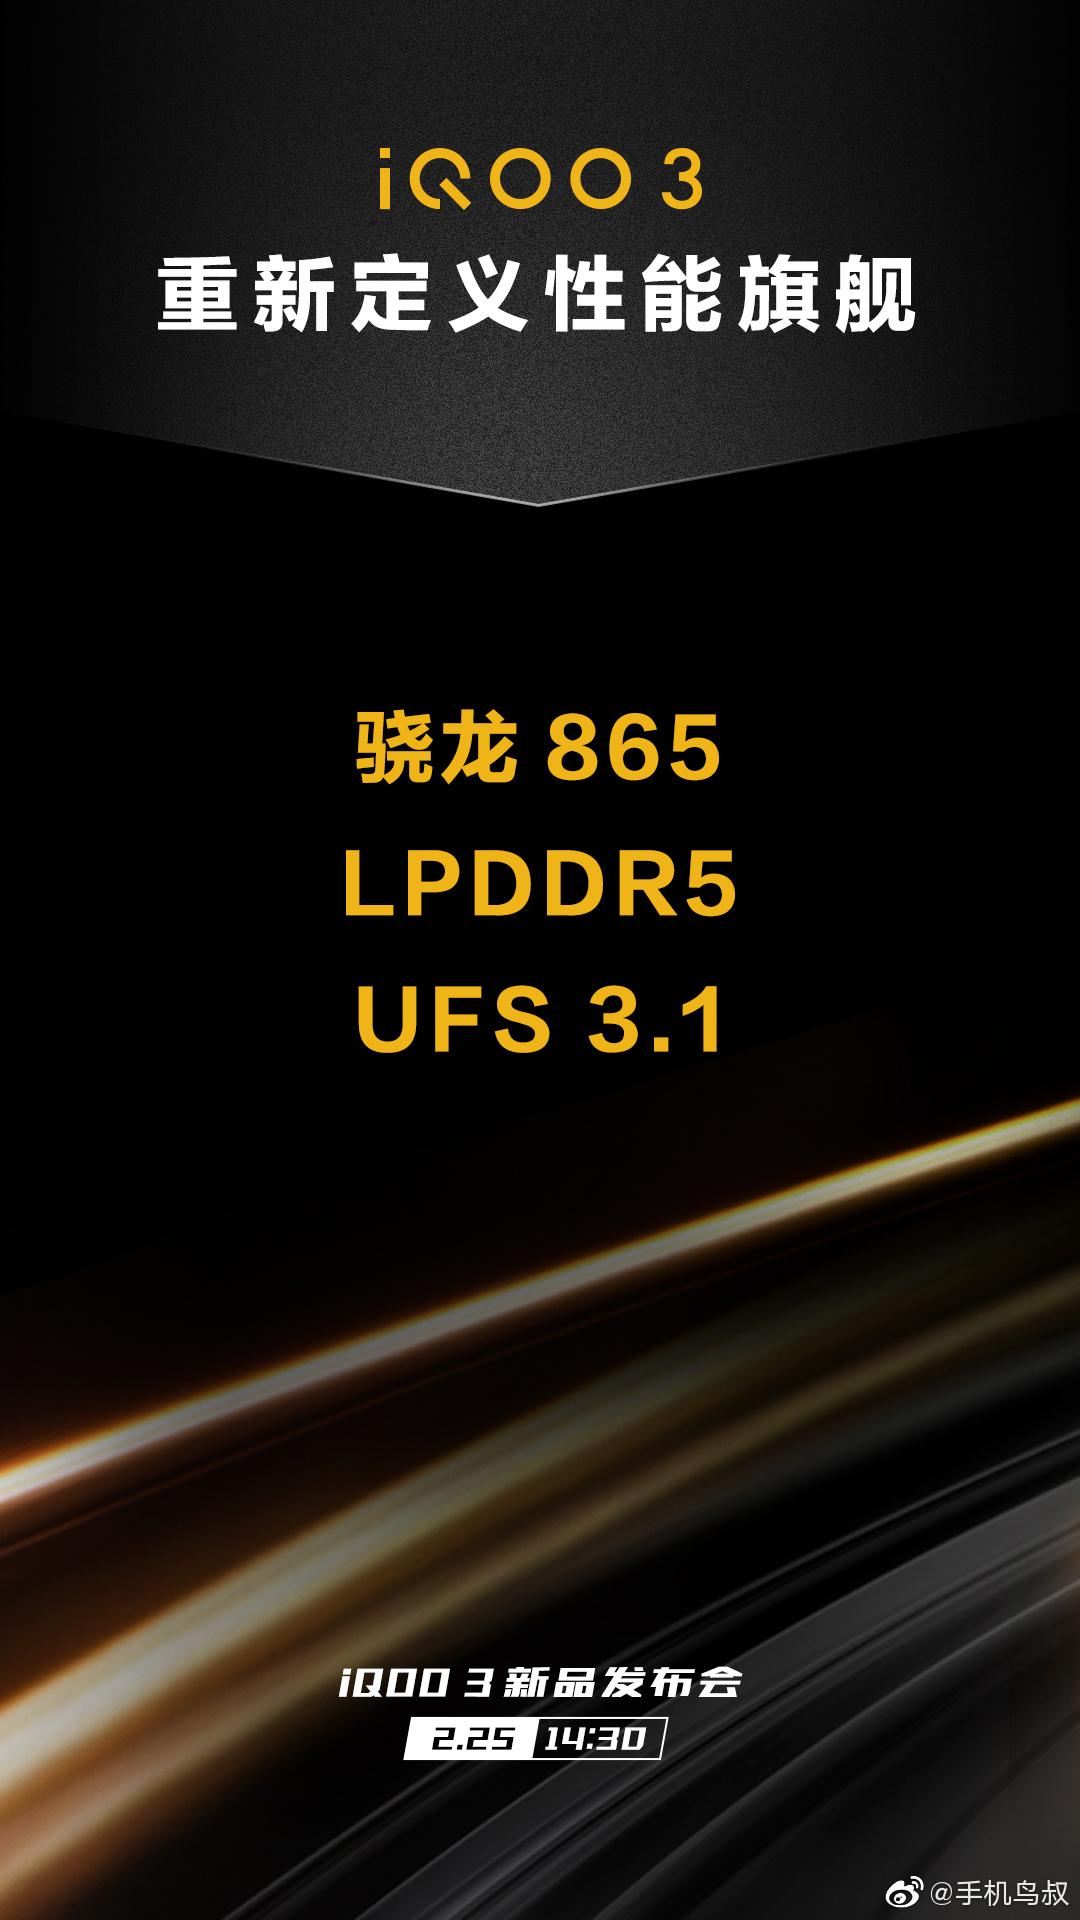 iQOO 3配置正式官宣,骁龙865+UFS 3.1+LPDDR 5妥妥的新一代机皇